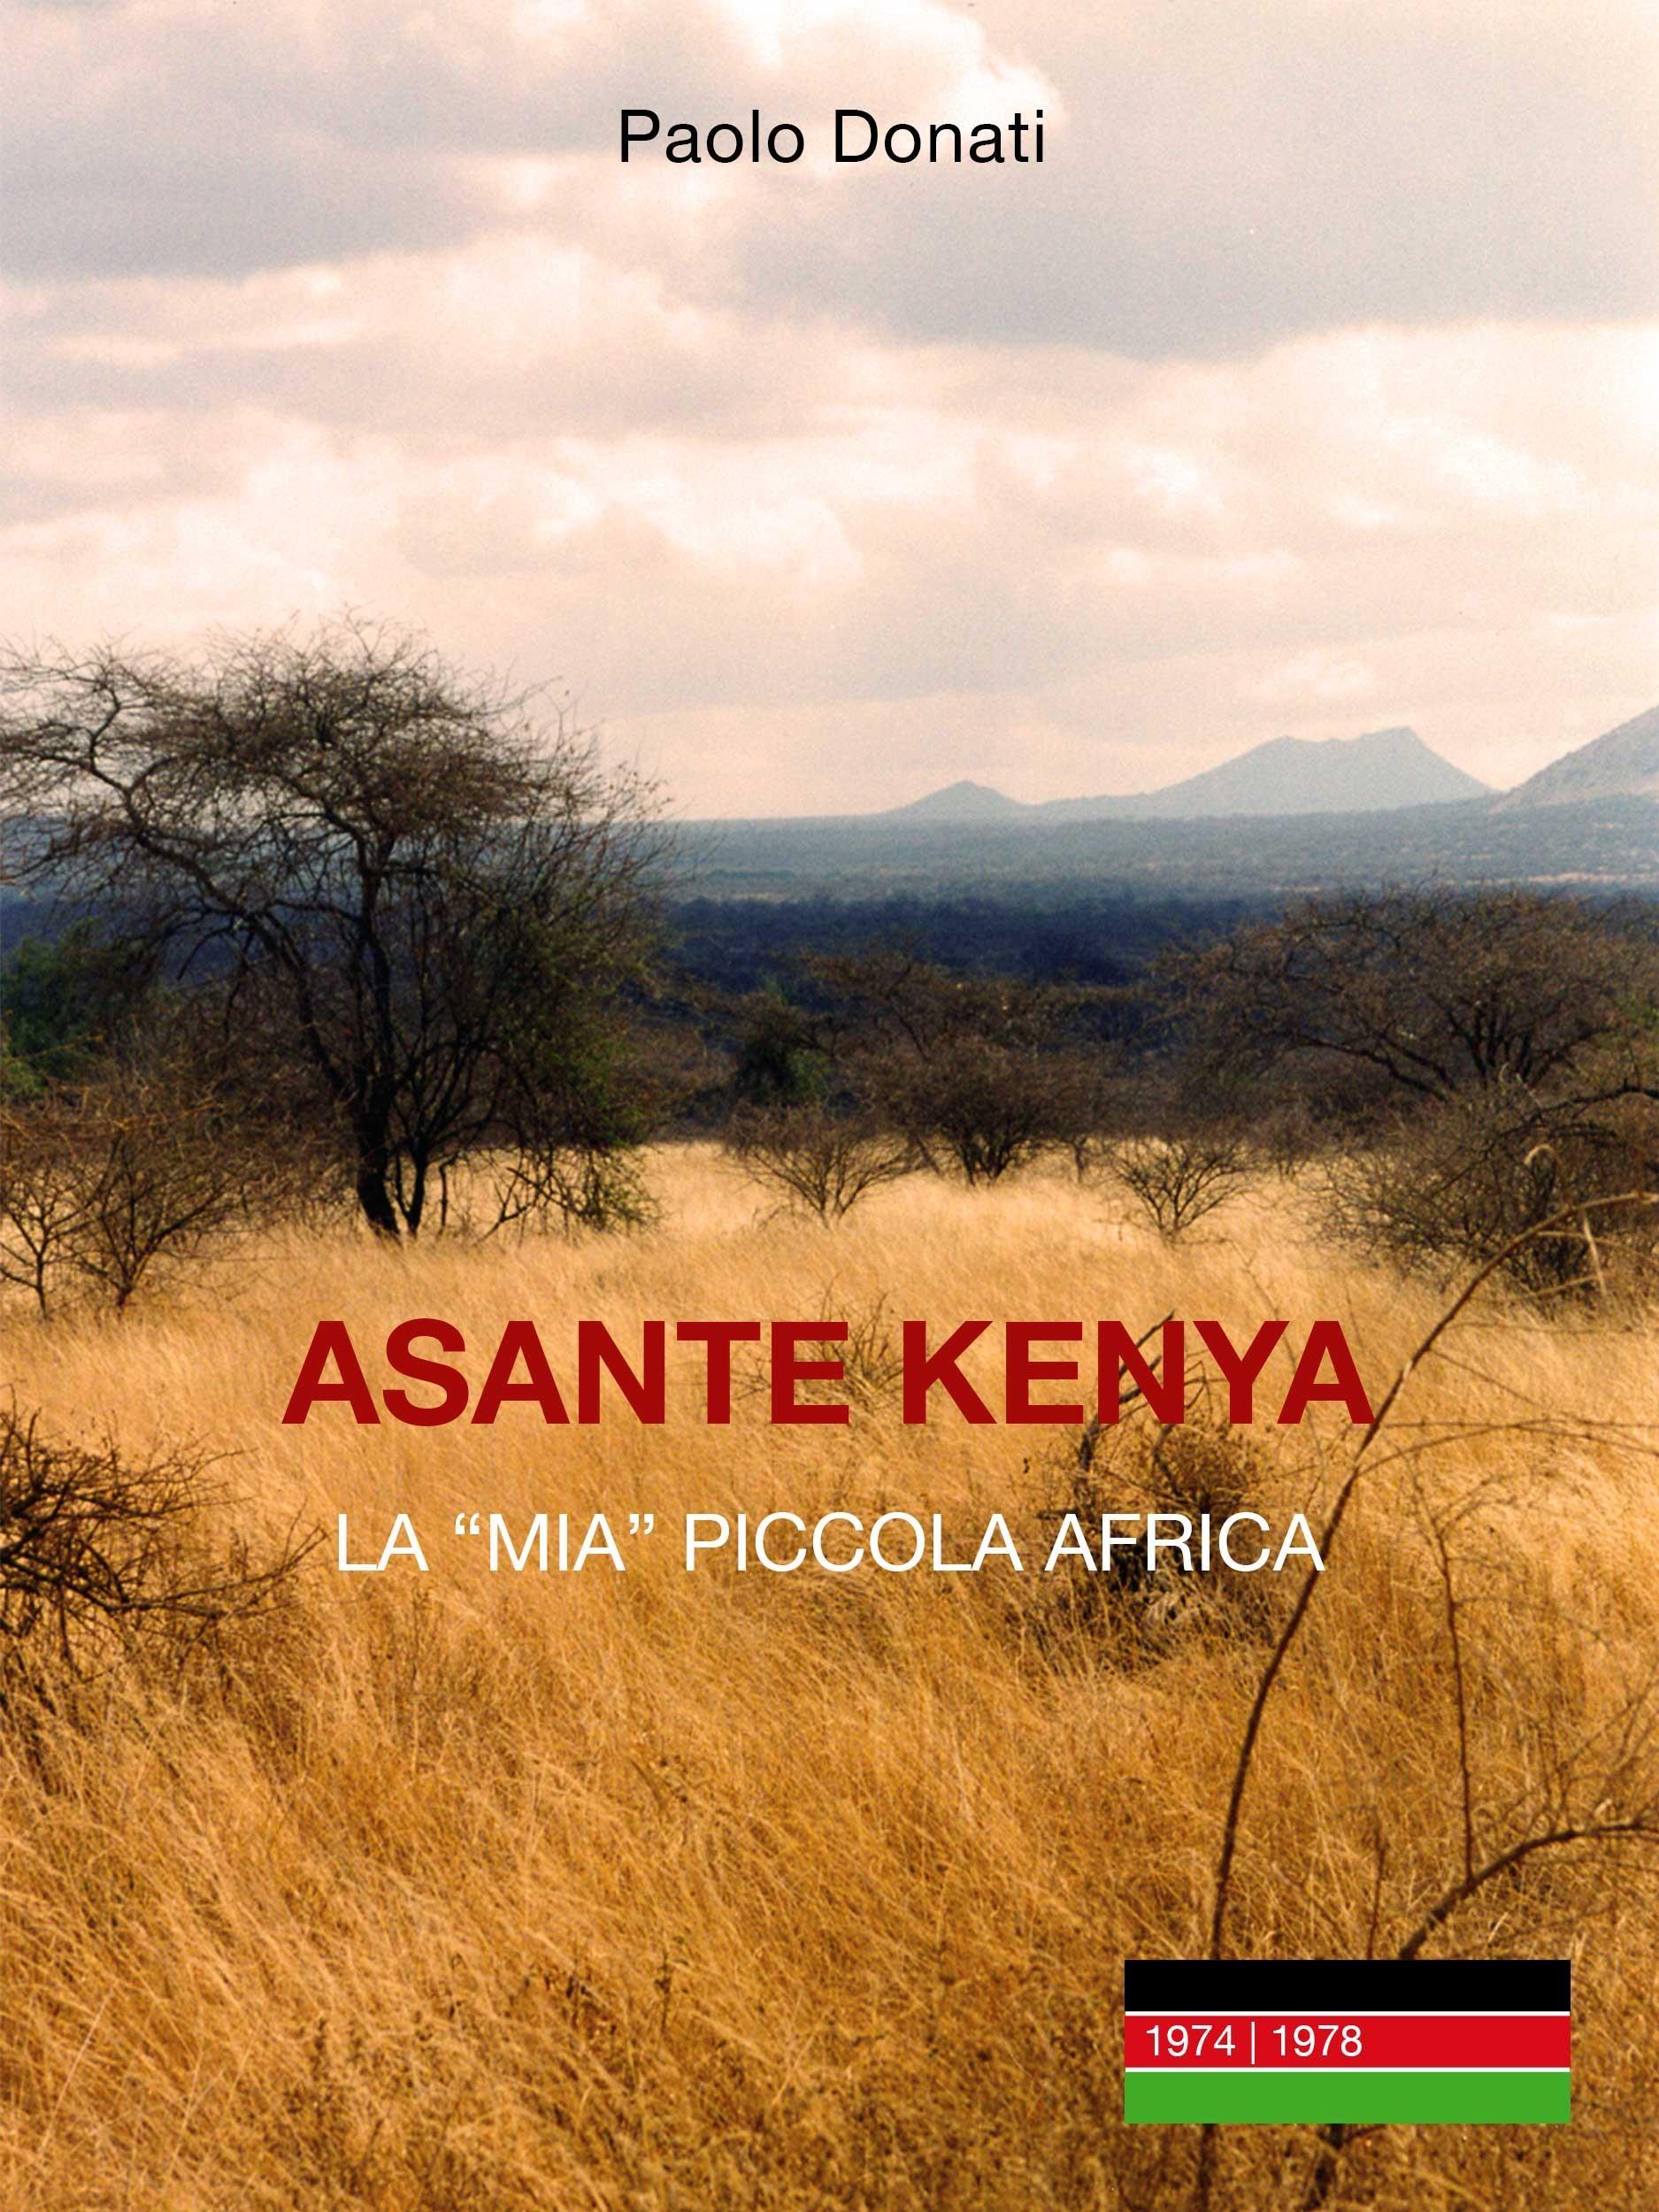 Asante Kenya: la mia (piccola) Africa